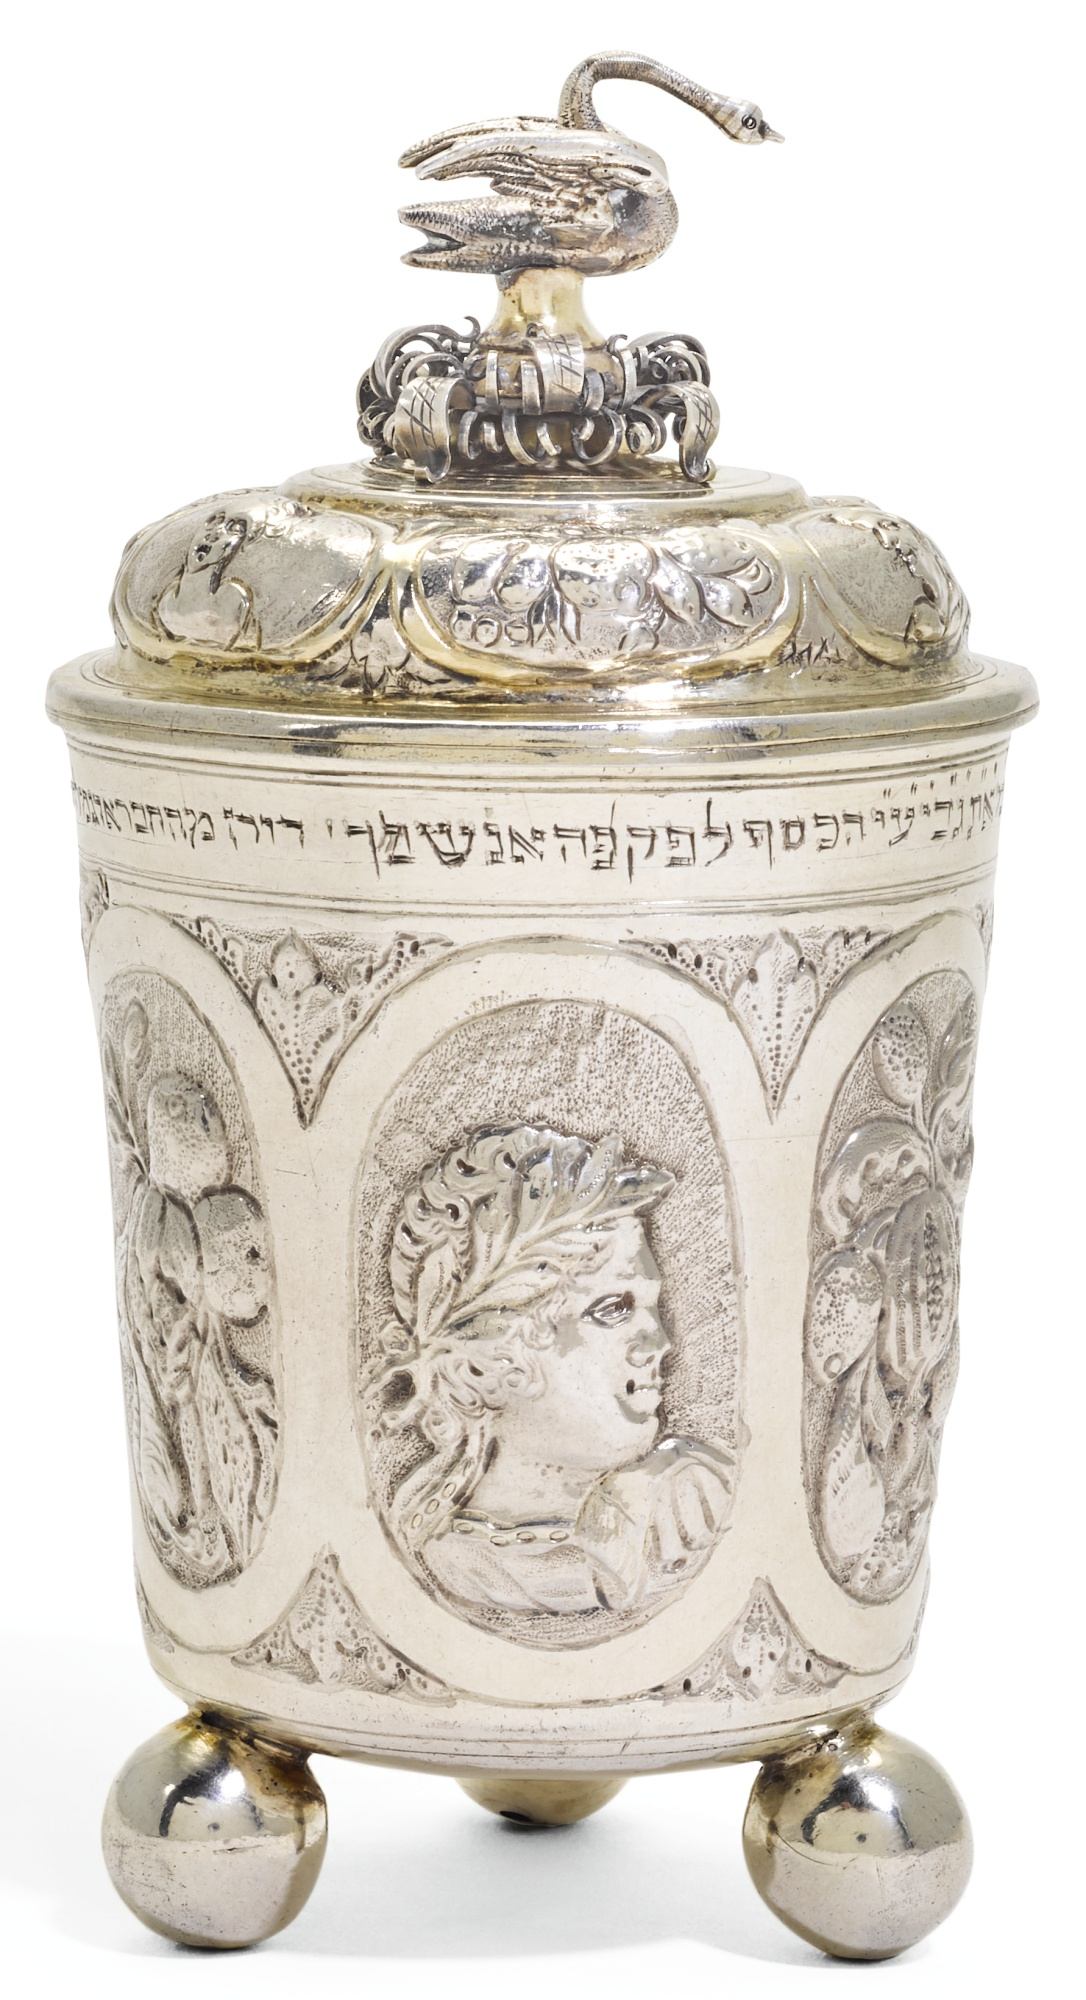 A GERMAN PARCEL-GILT SILVER BEAKER AND COVER, JACOB PFAFF, NUREMBERG, CIRCA 1680